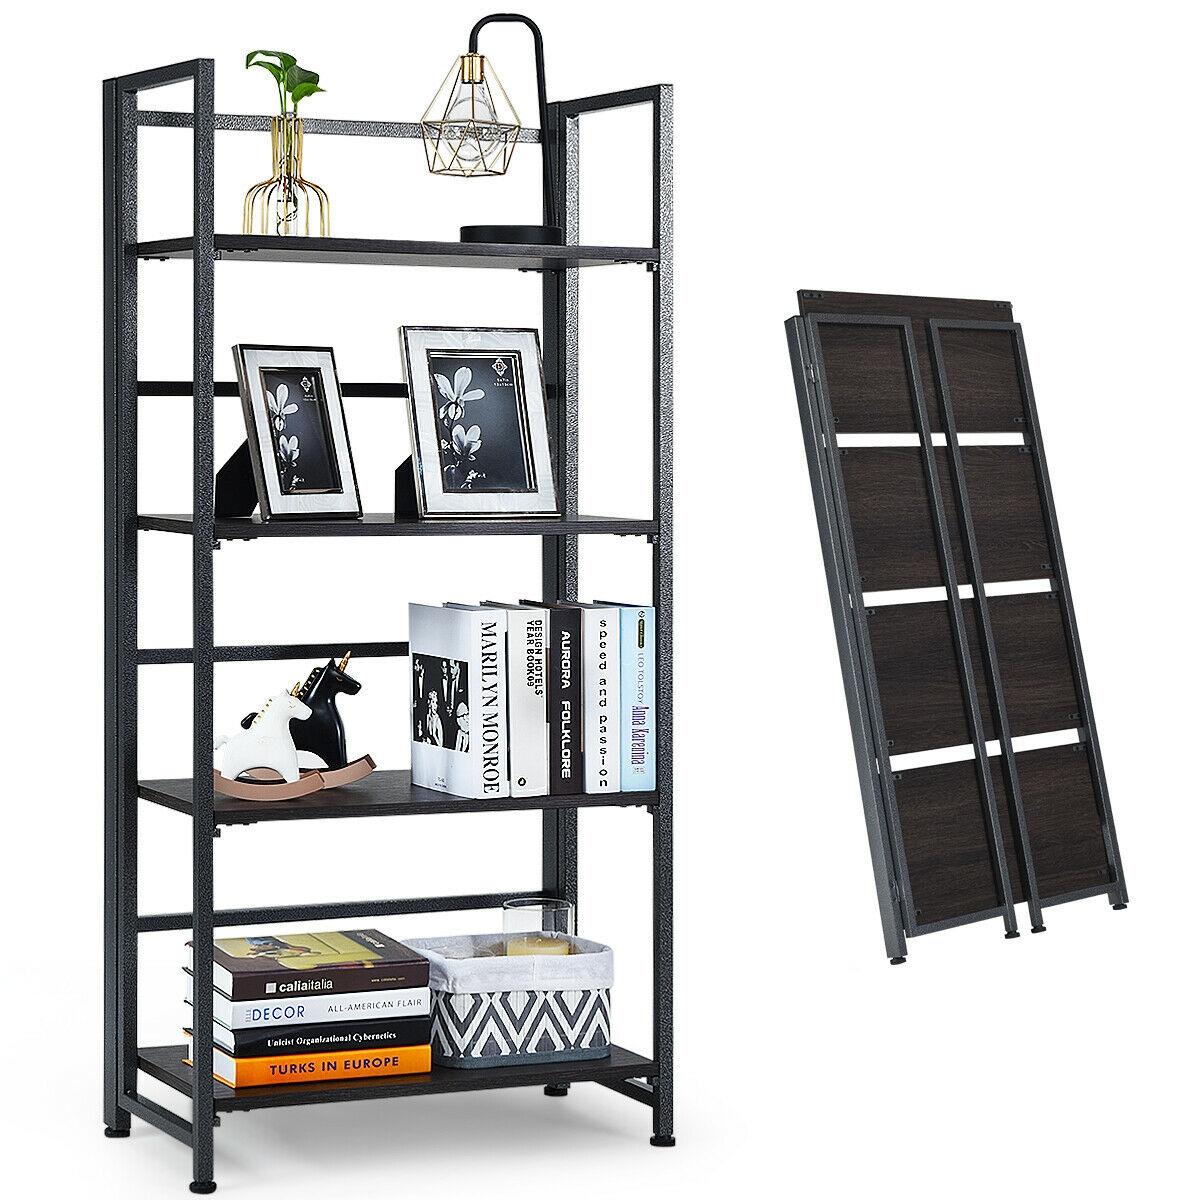 4-Tier Folding Bookshelf Foldable Portable Metal Storage